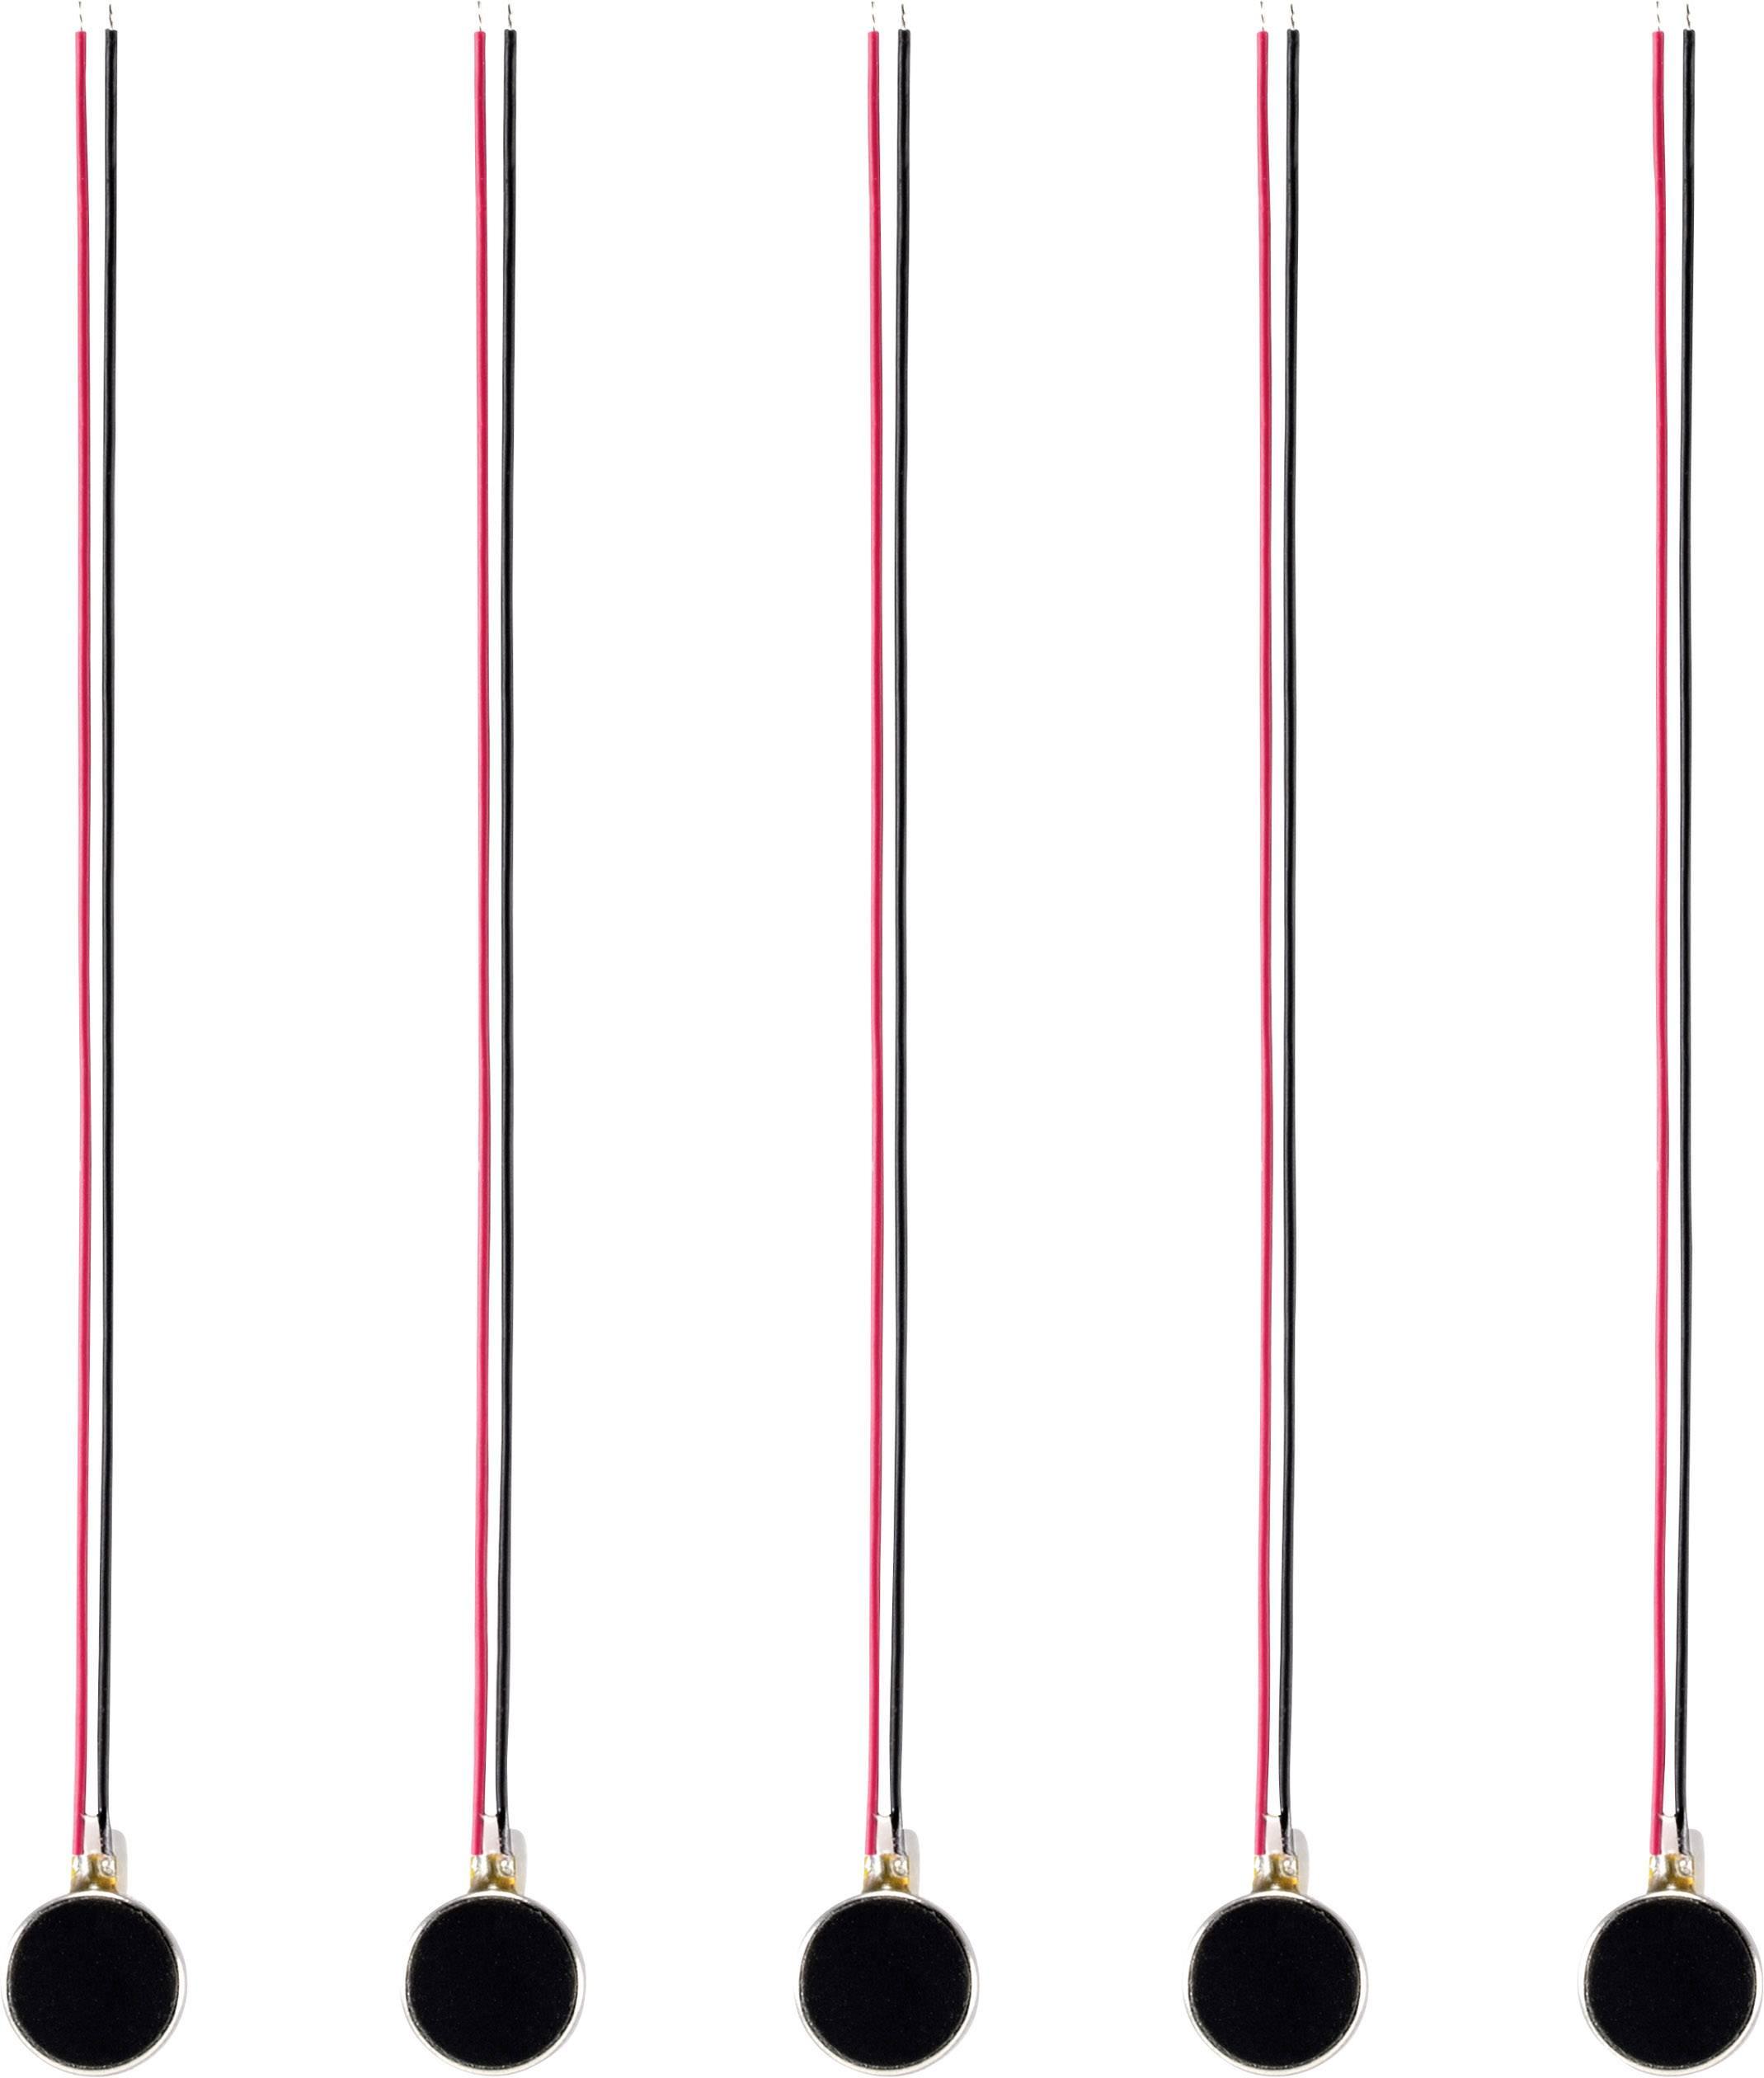 10 Stück OBO Bettermann Quick-Pipe-Verbind.-muffe 2953 M M20 RW 2153973